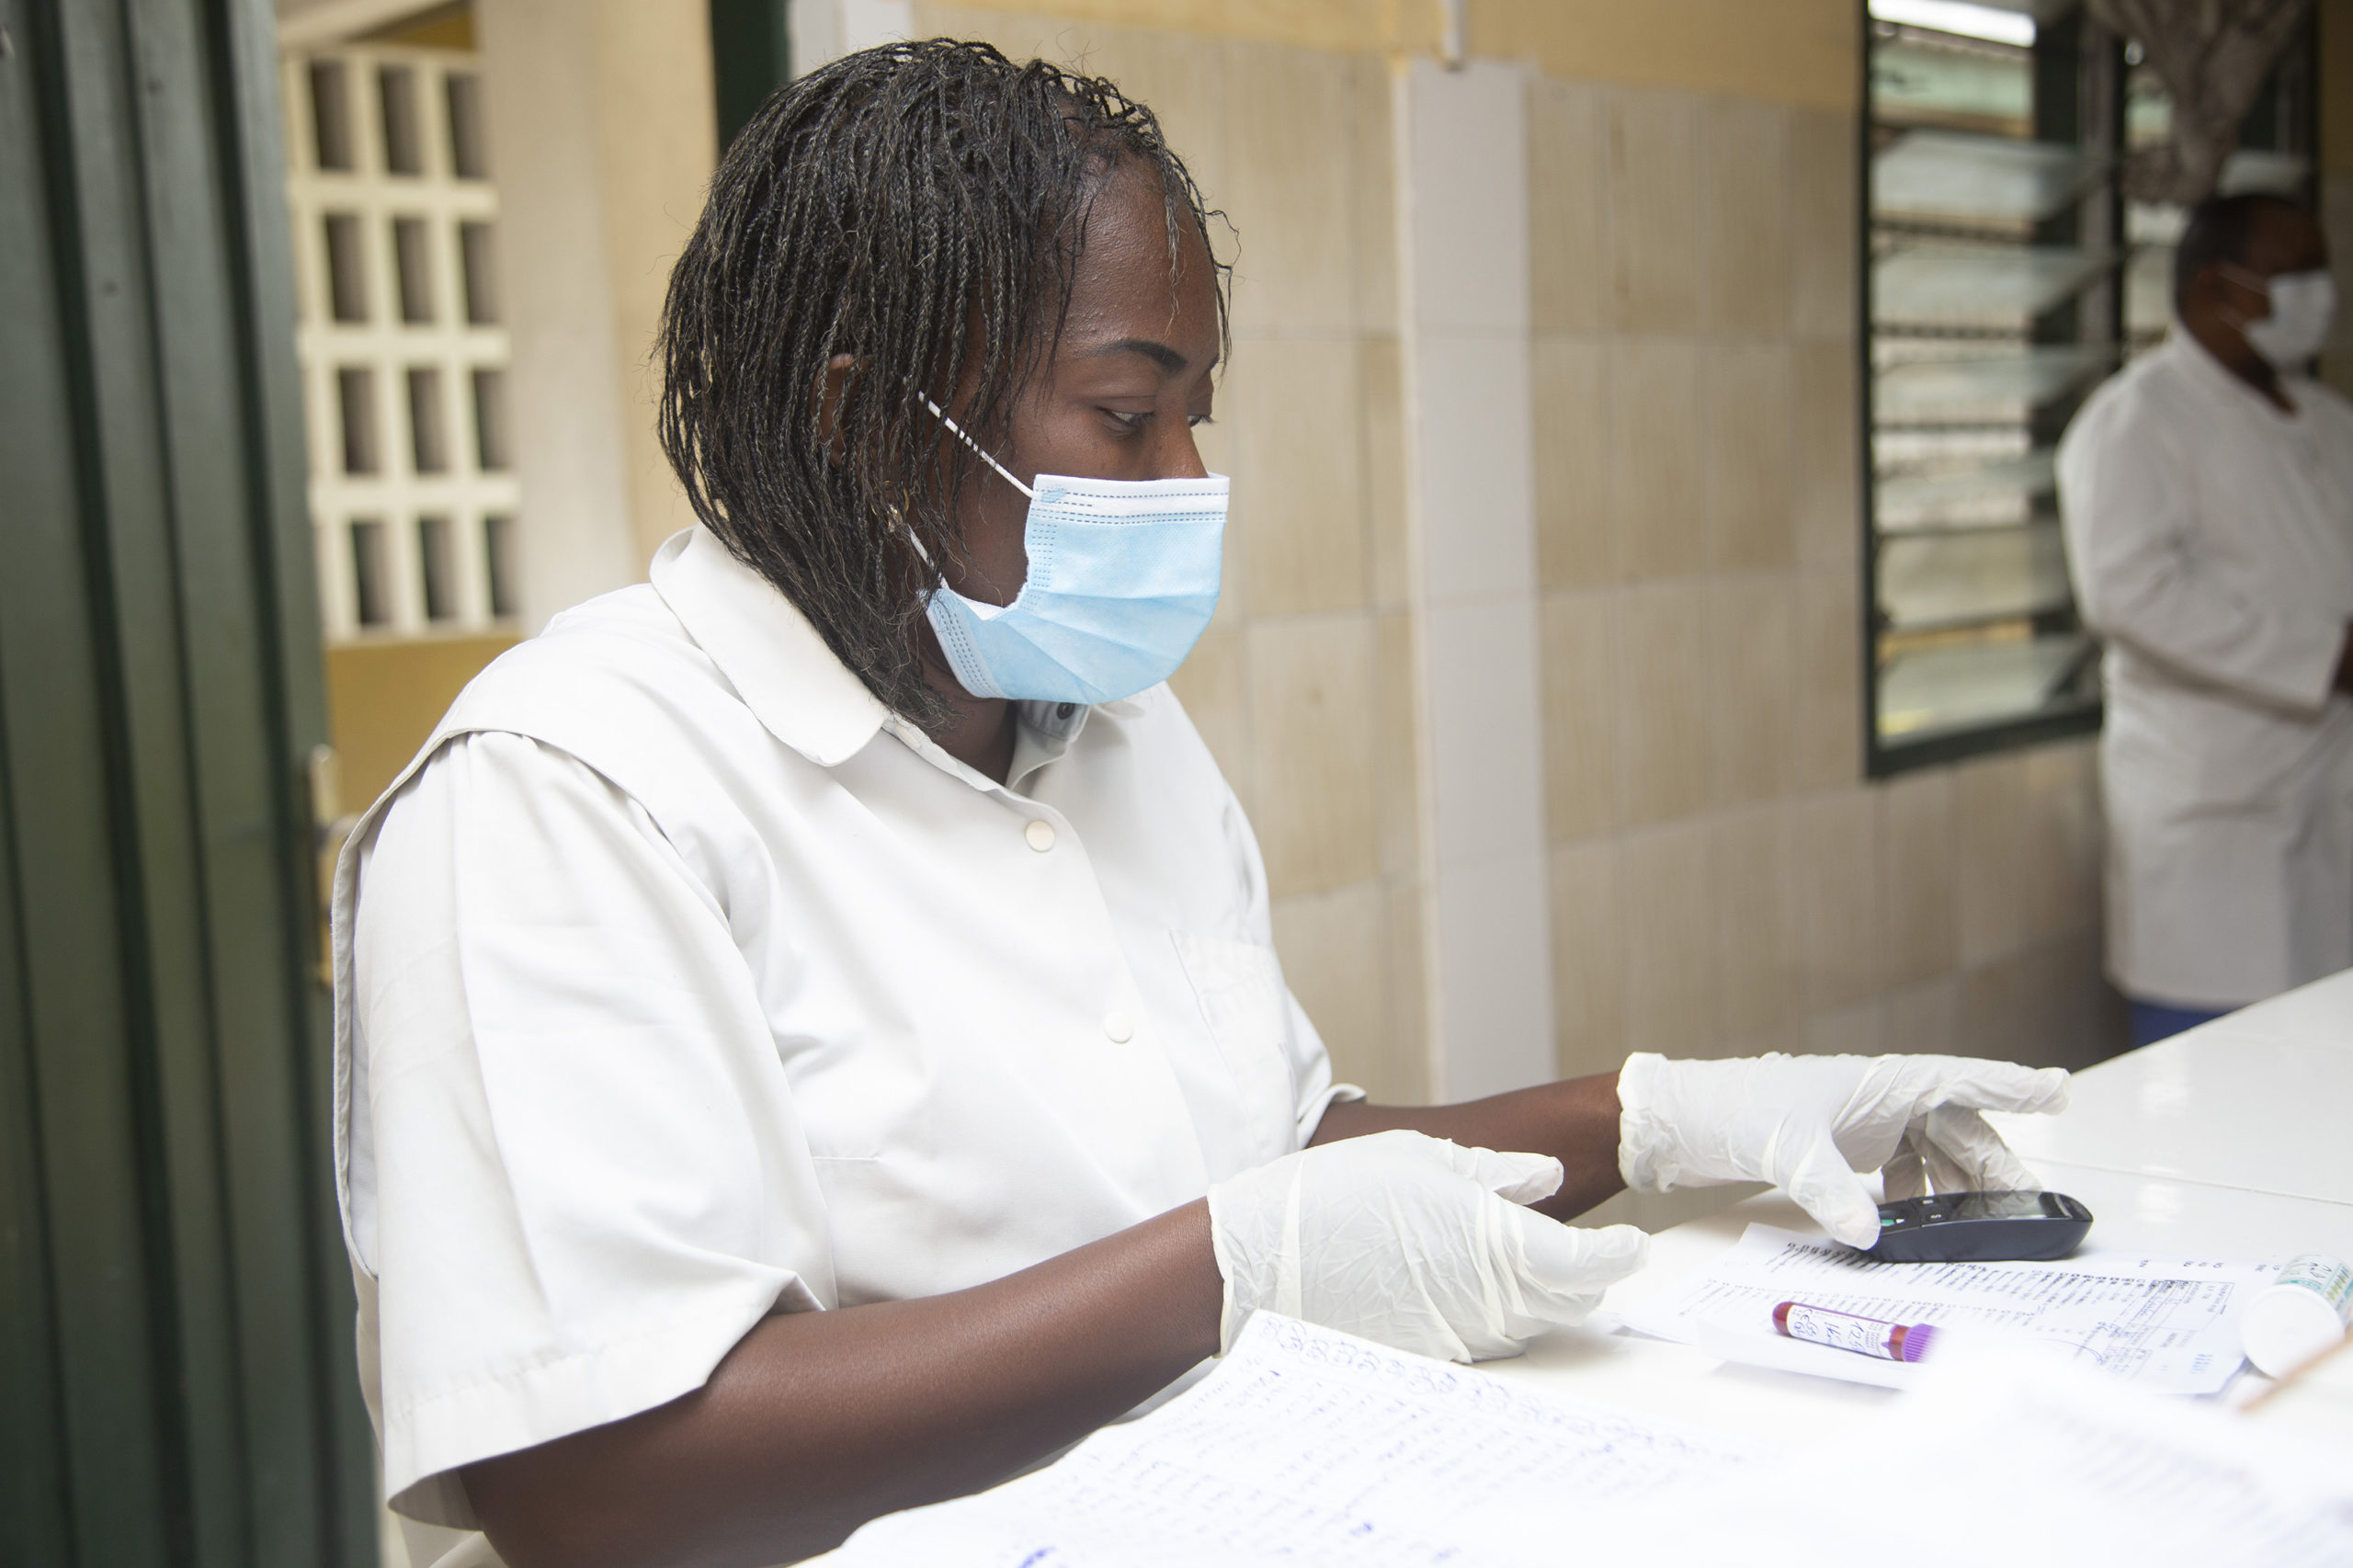 Healthcare worker in mask